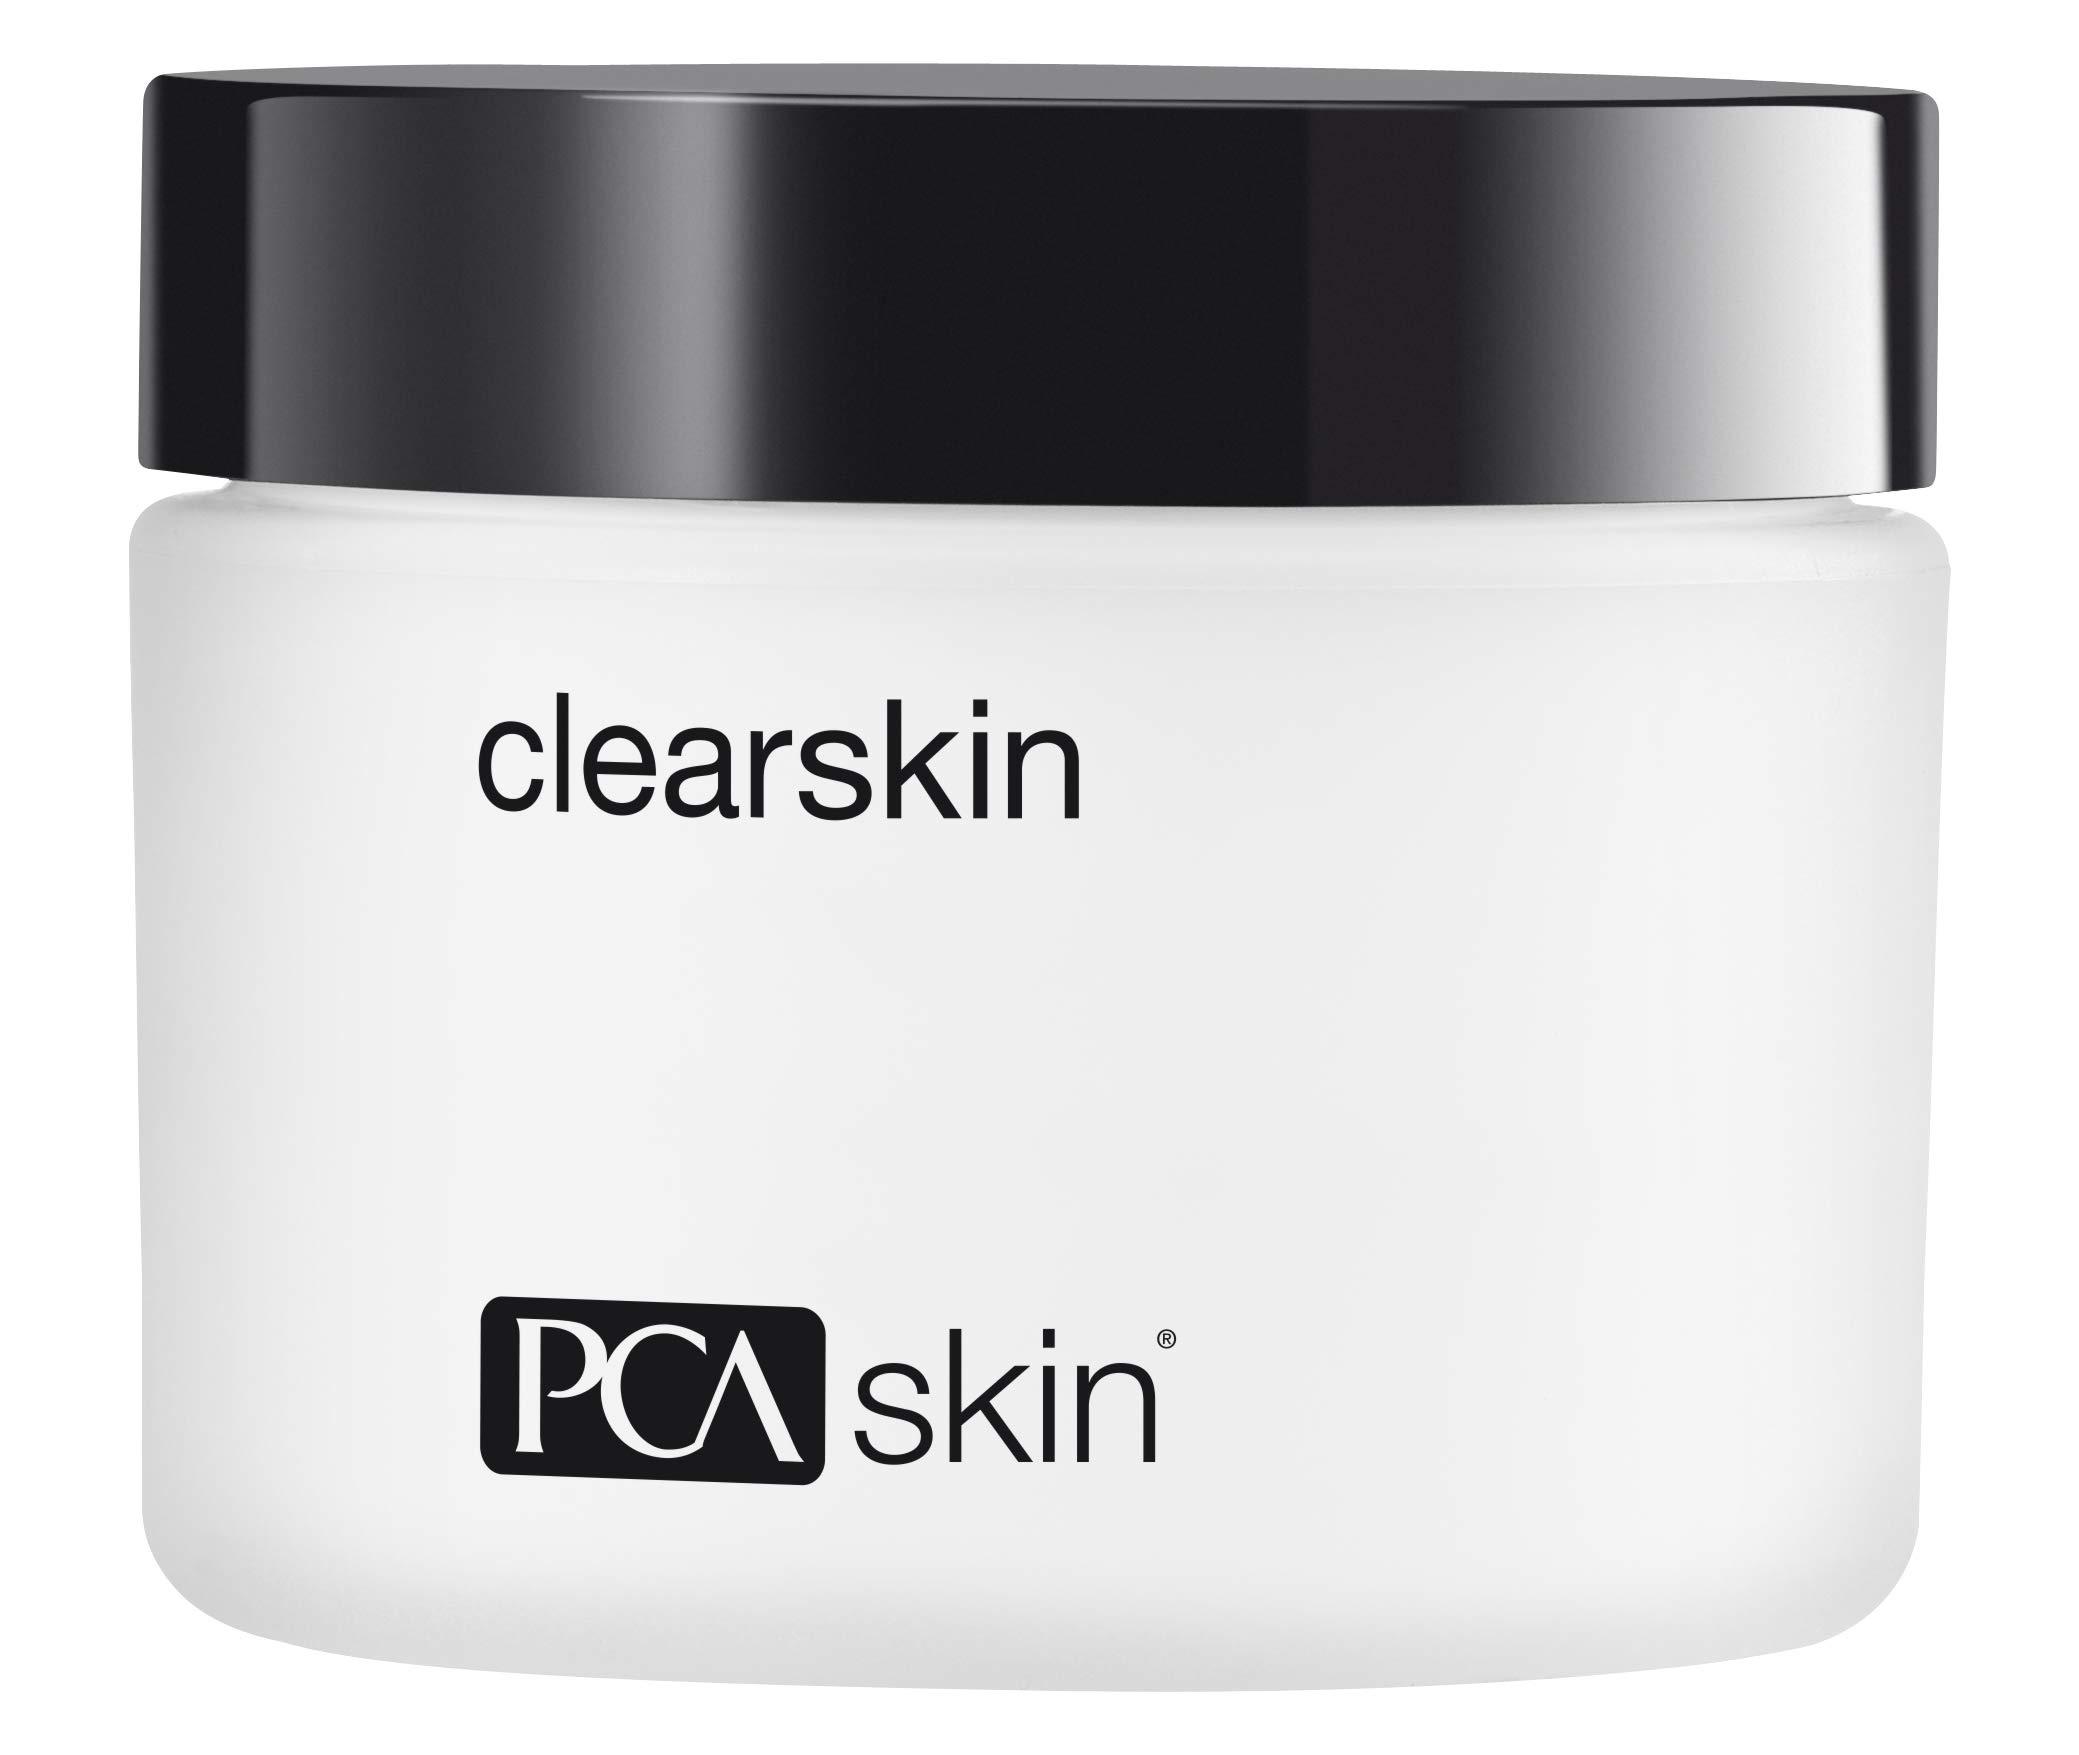 PCA SKIN Clearskin, Calming & Balancing Facial Moisturizer, 1.7 ounce by PCA SKIN